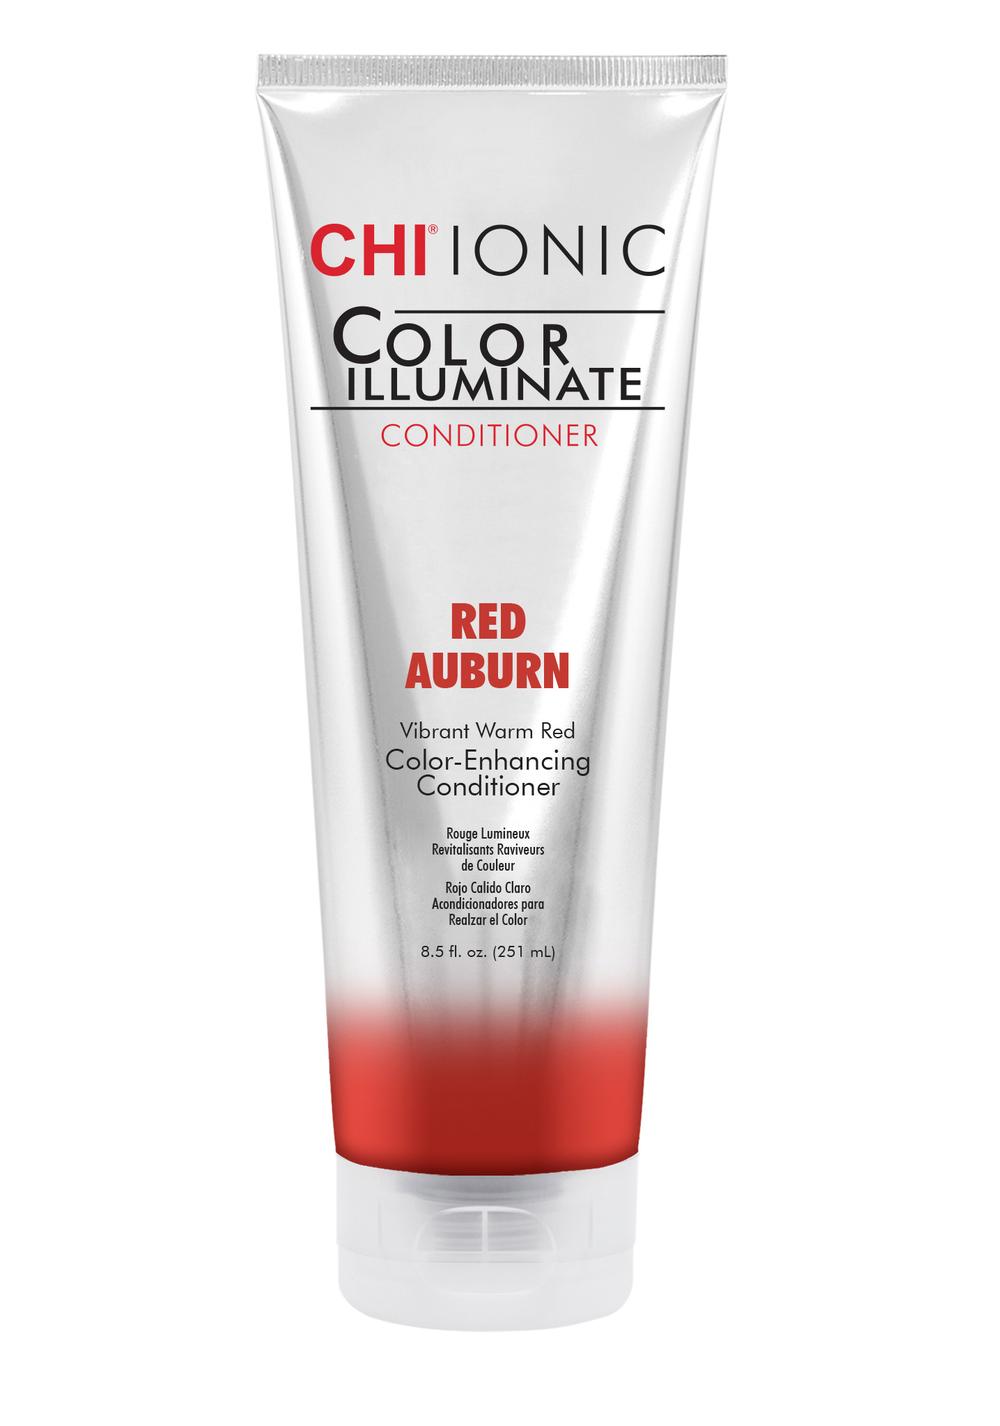 CHI Ionic Color Illuminate Red Auburn